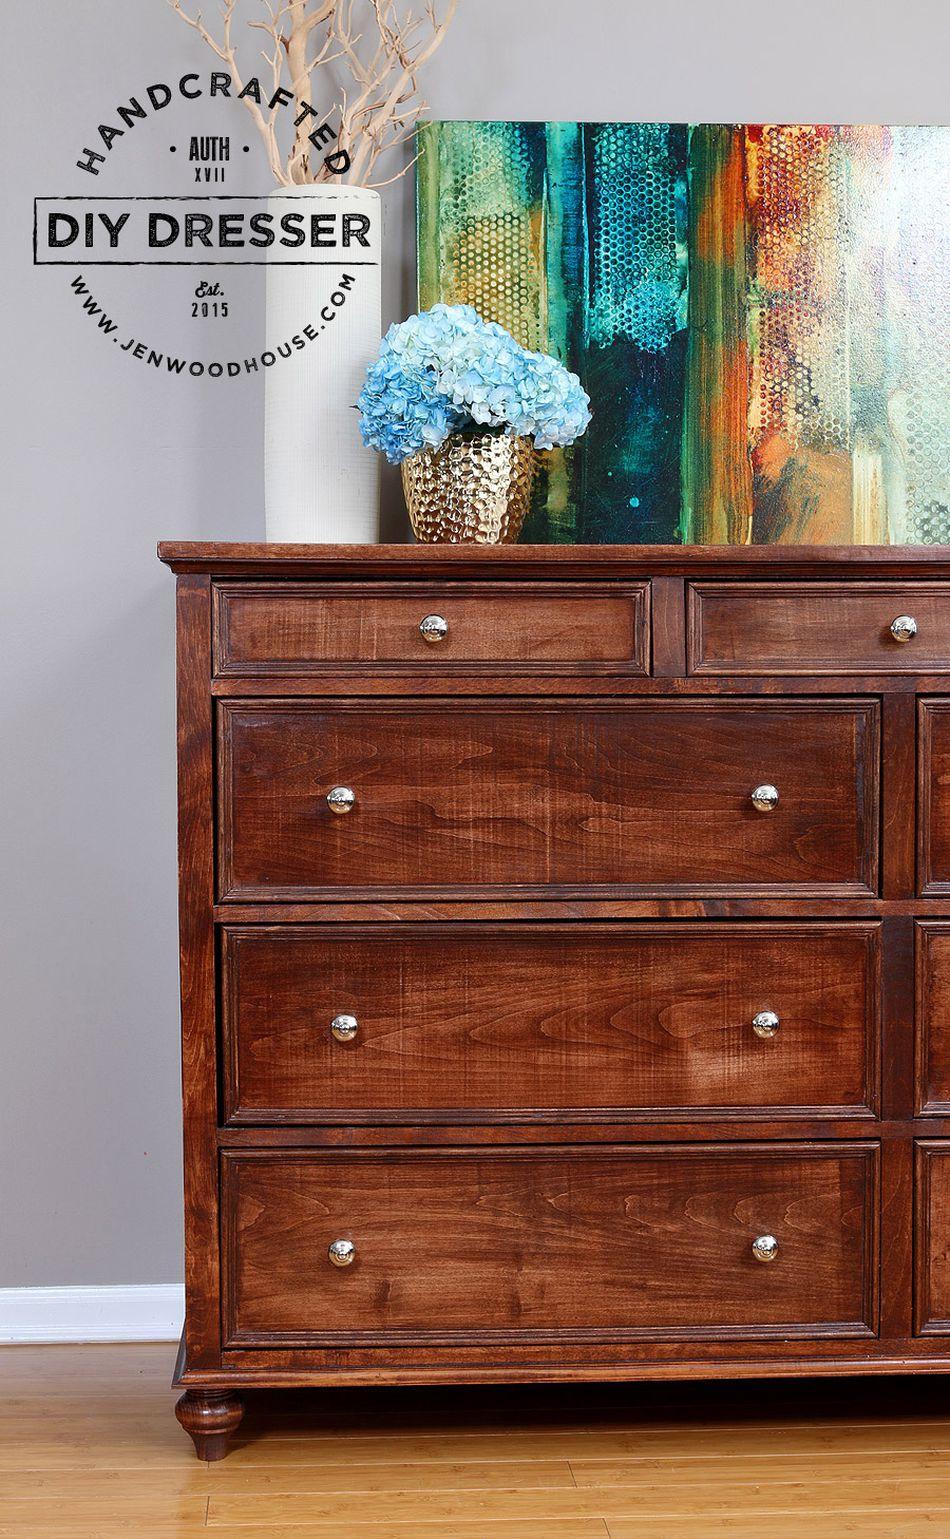 A DIY 11-drawer dresser